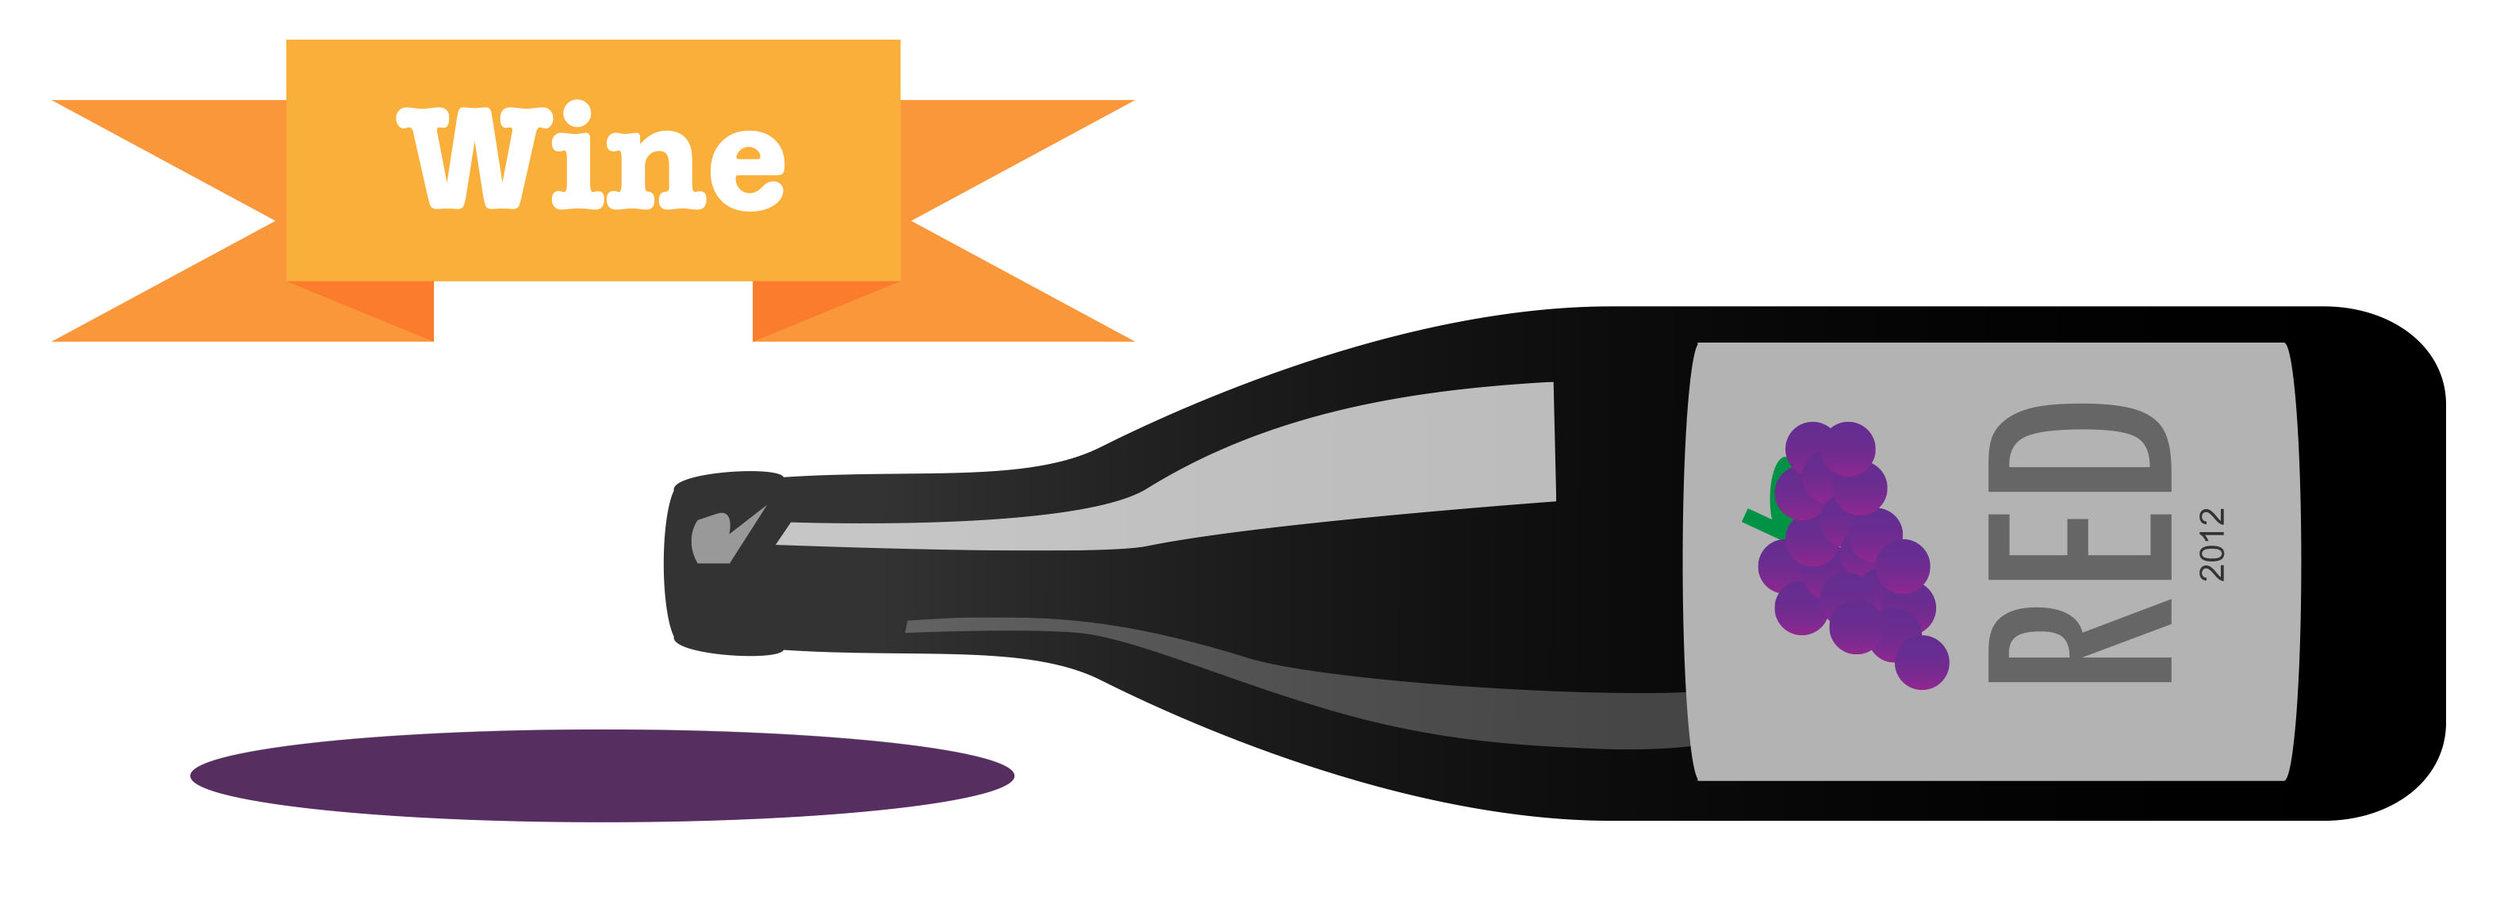 Wine, the preferred alcoholic beverage of American women.